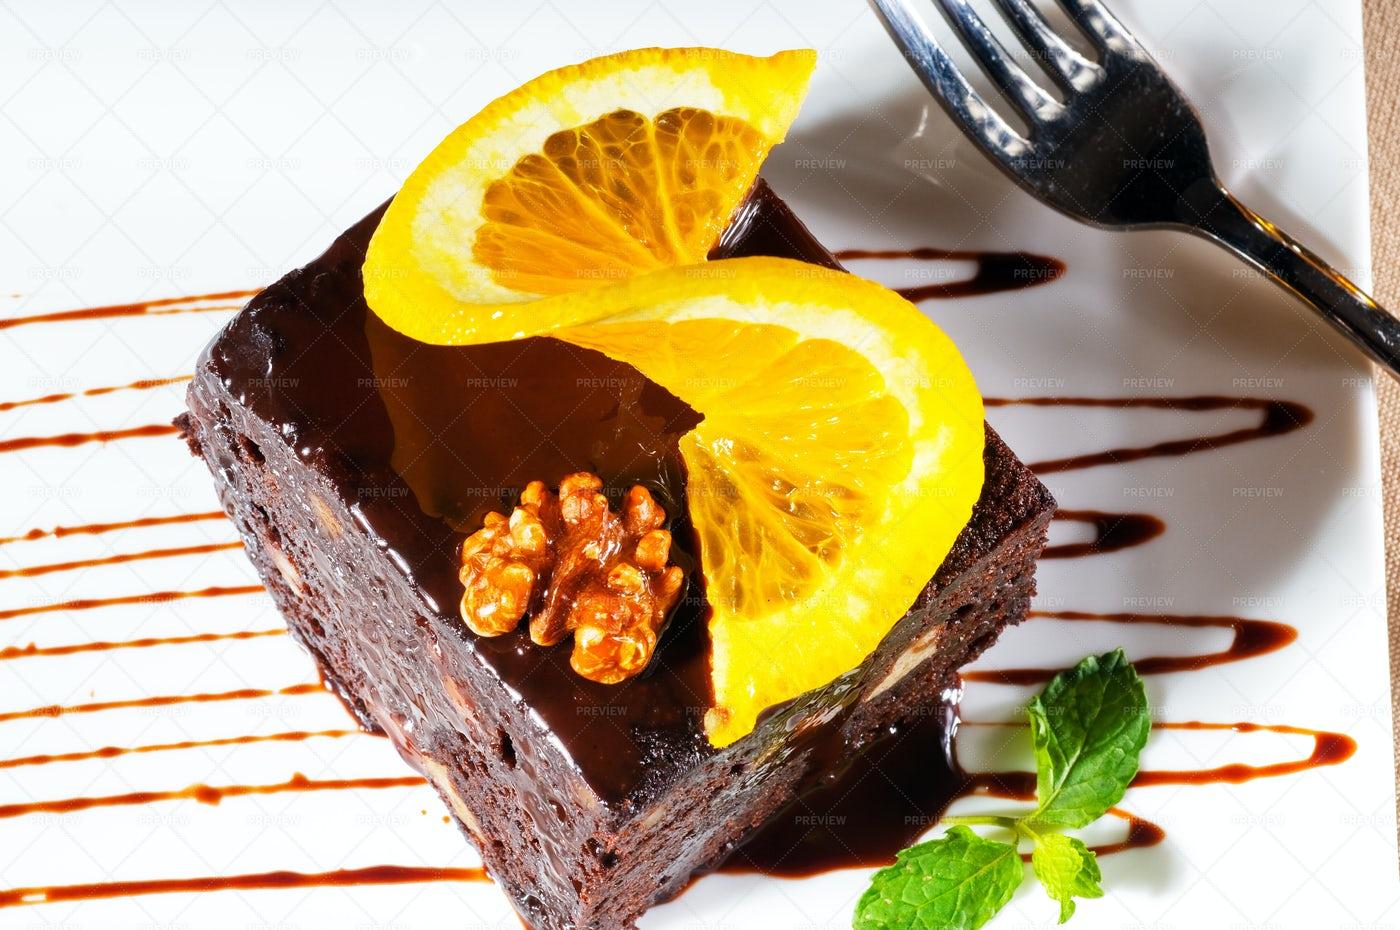 Chocolate And Walnuts Cake: Stock Photos